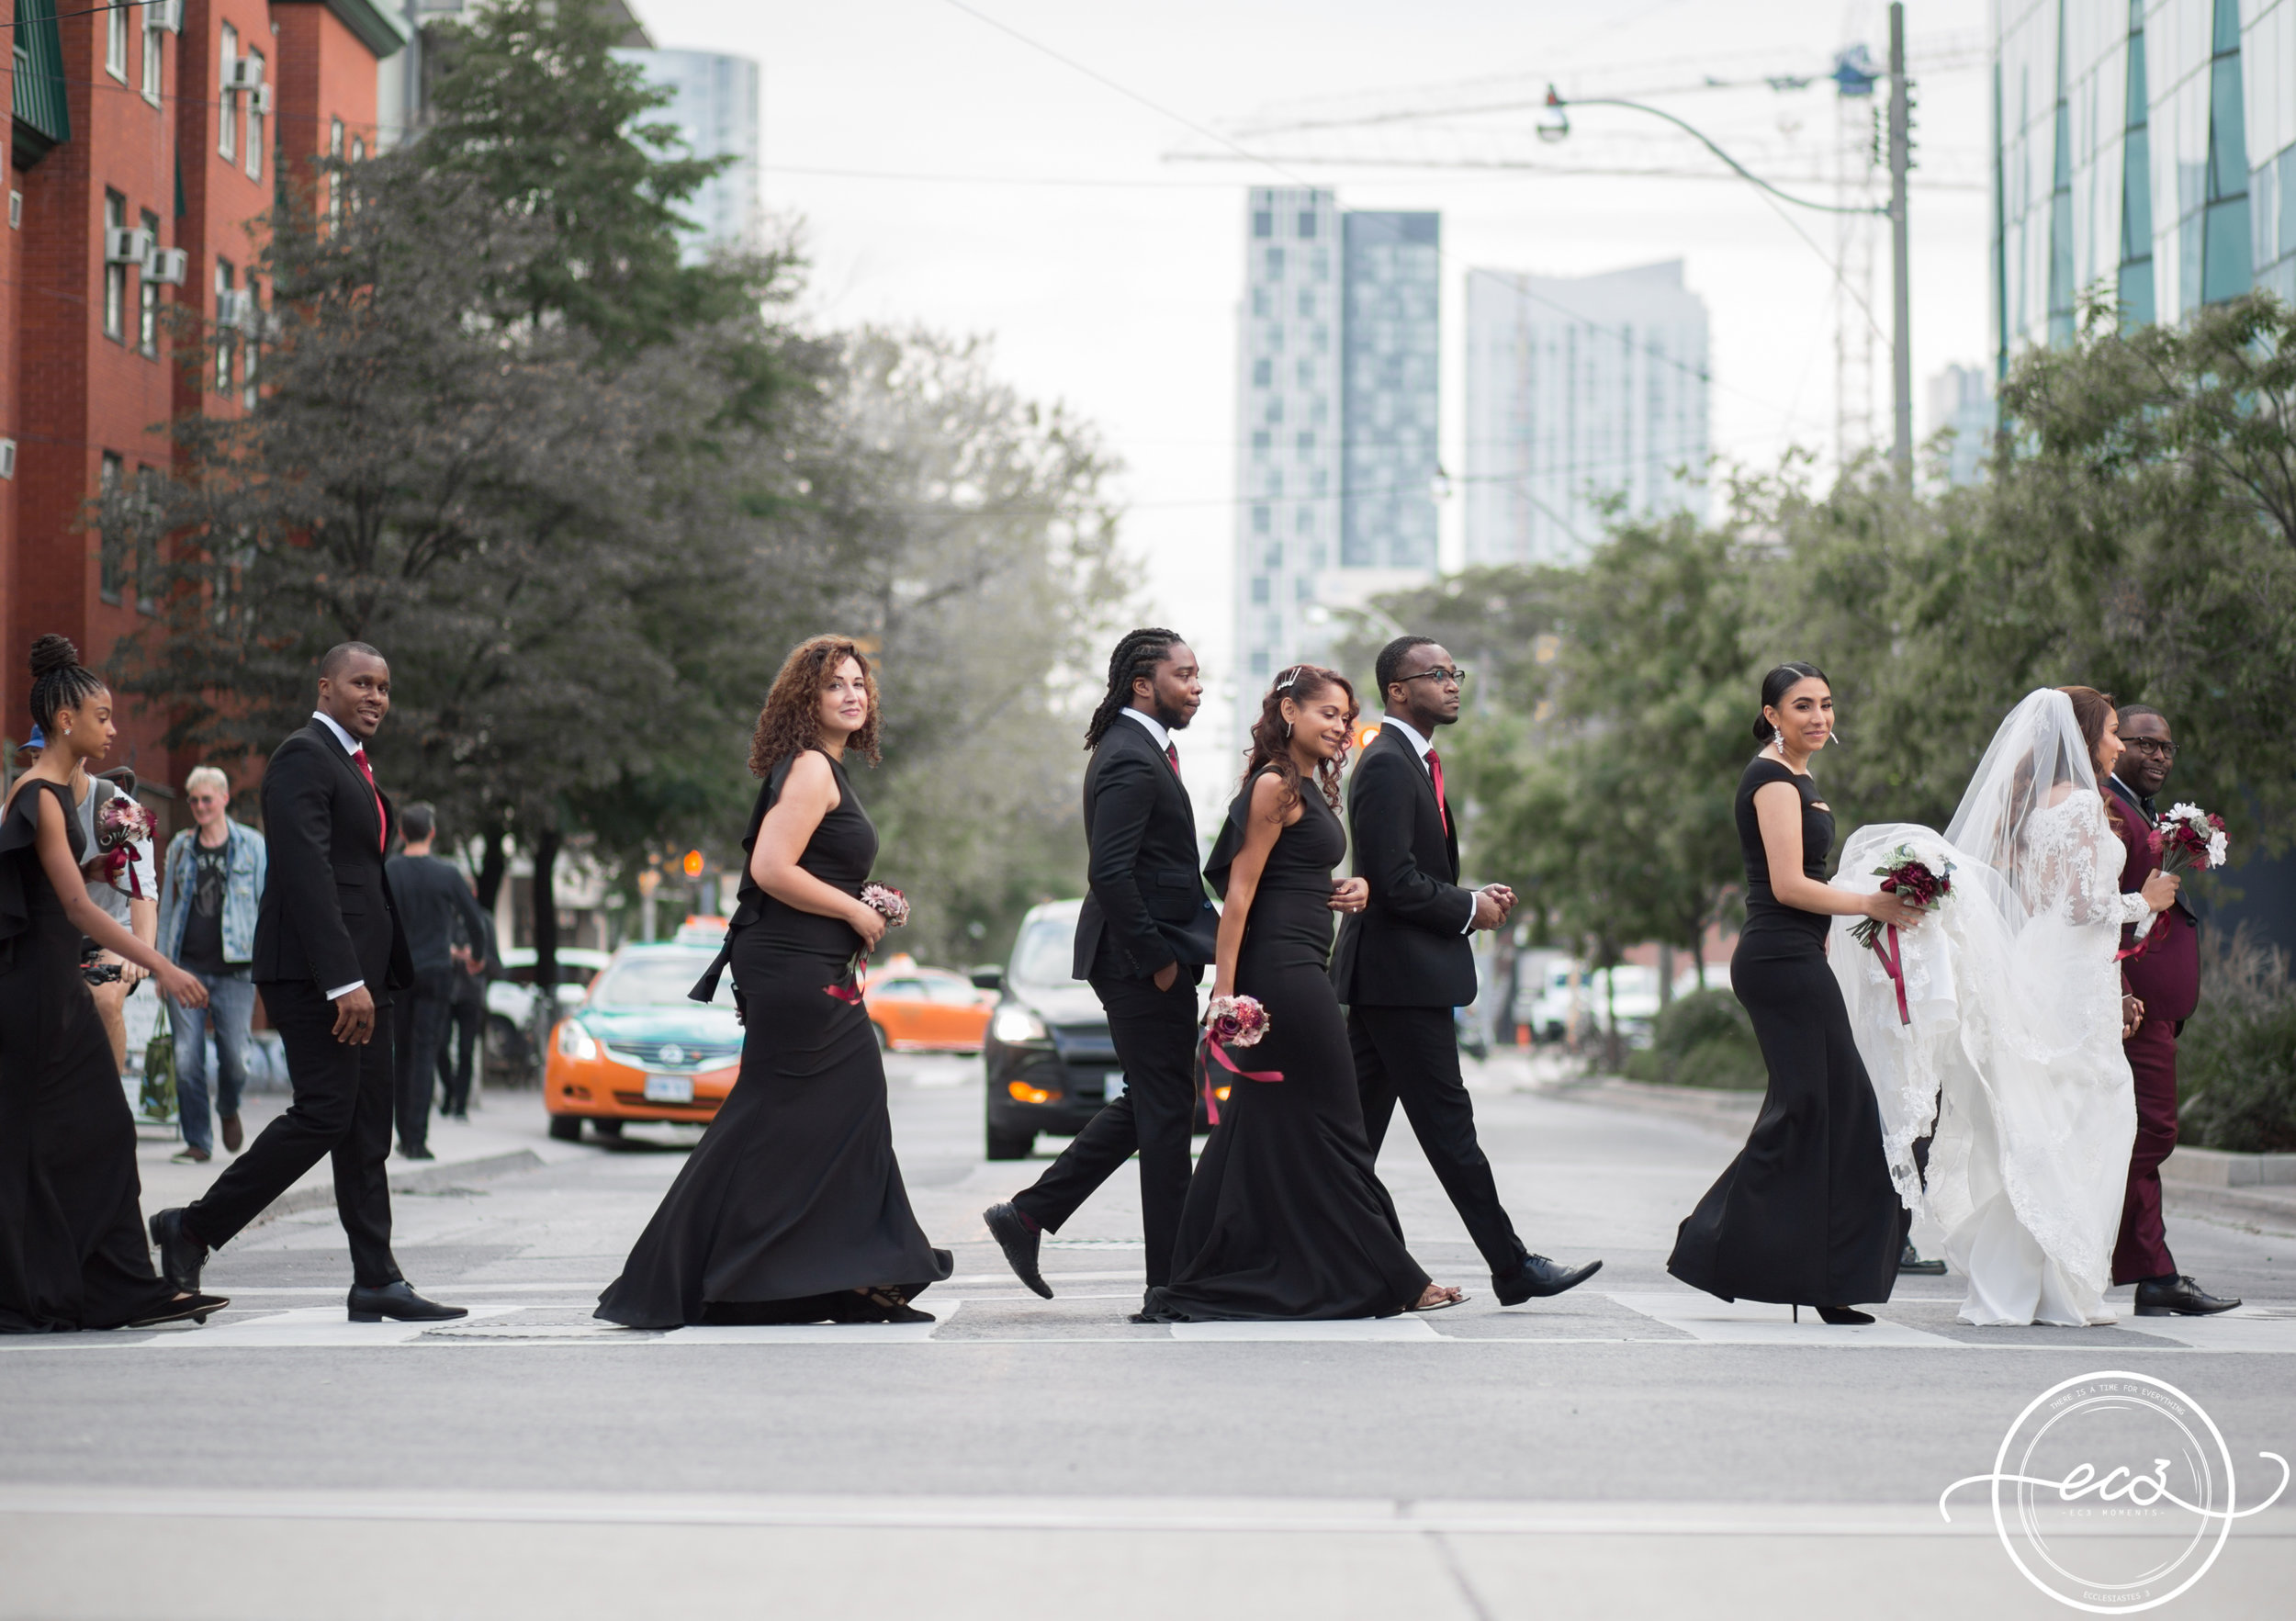 AA-Rustic-Toronto-Burroughes-Wedding31.jpg